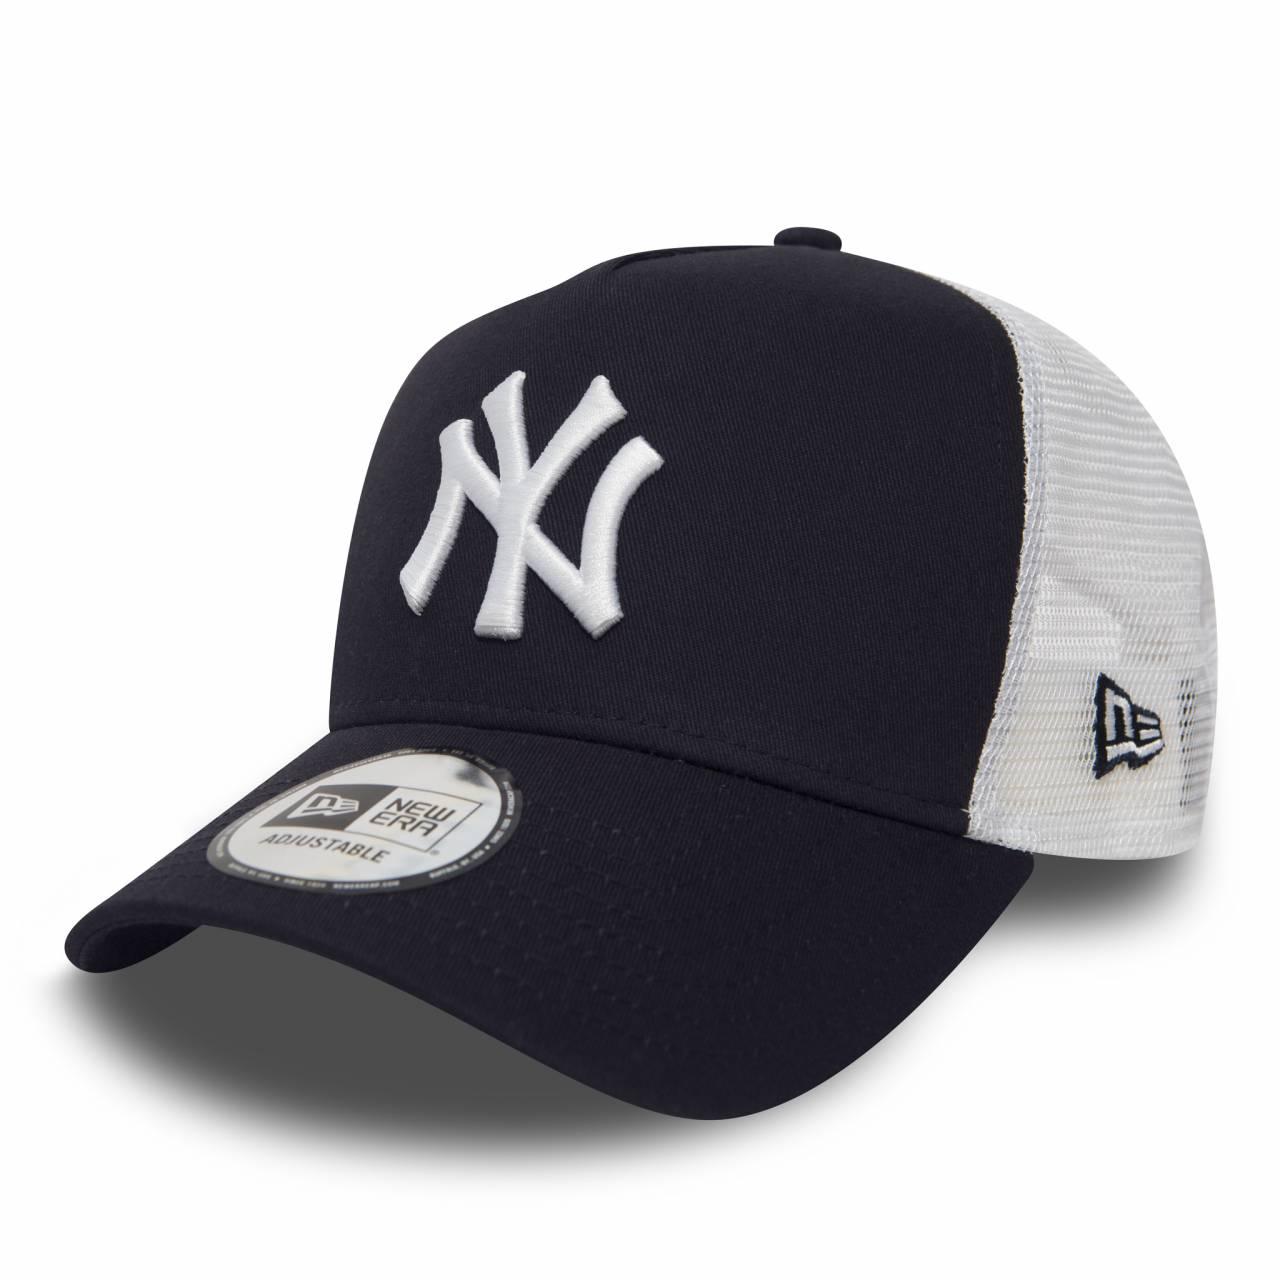 11588489 MLB TRUCKER NEW YORK YANKEES NAVY/WHITE CAP